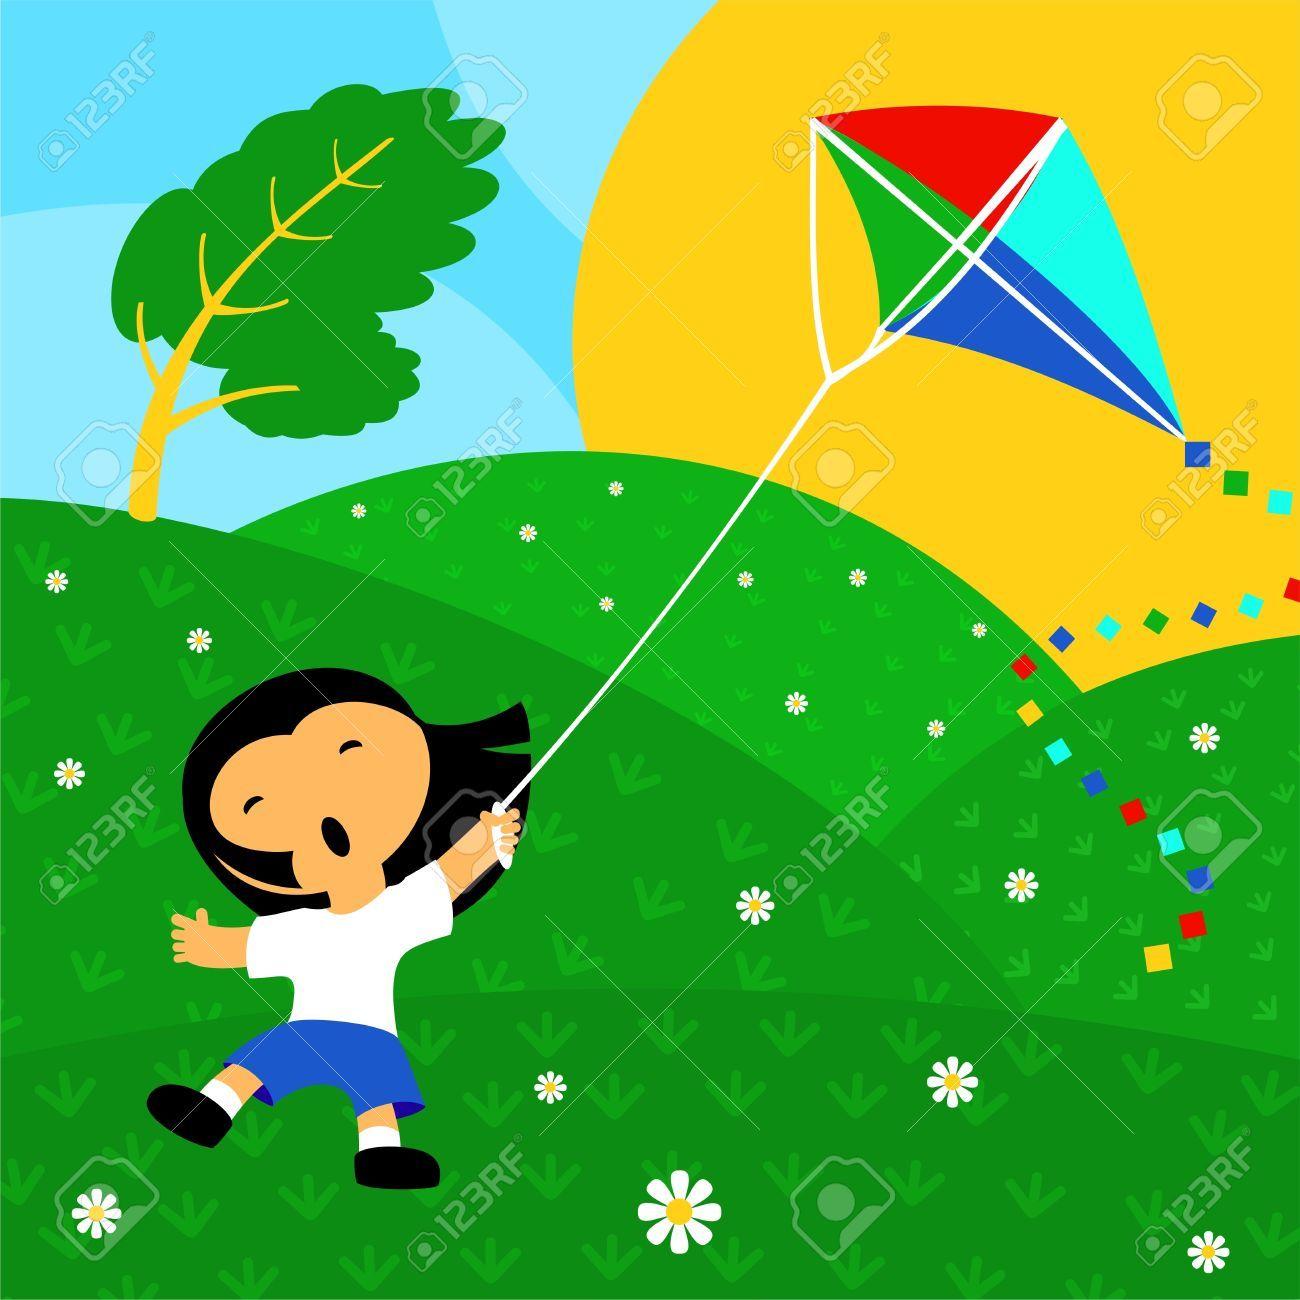 Windy day kite clipart 6 » Clipart Portal.